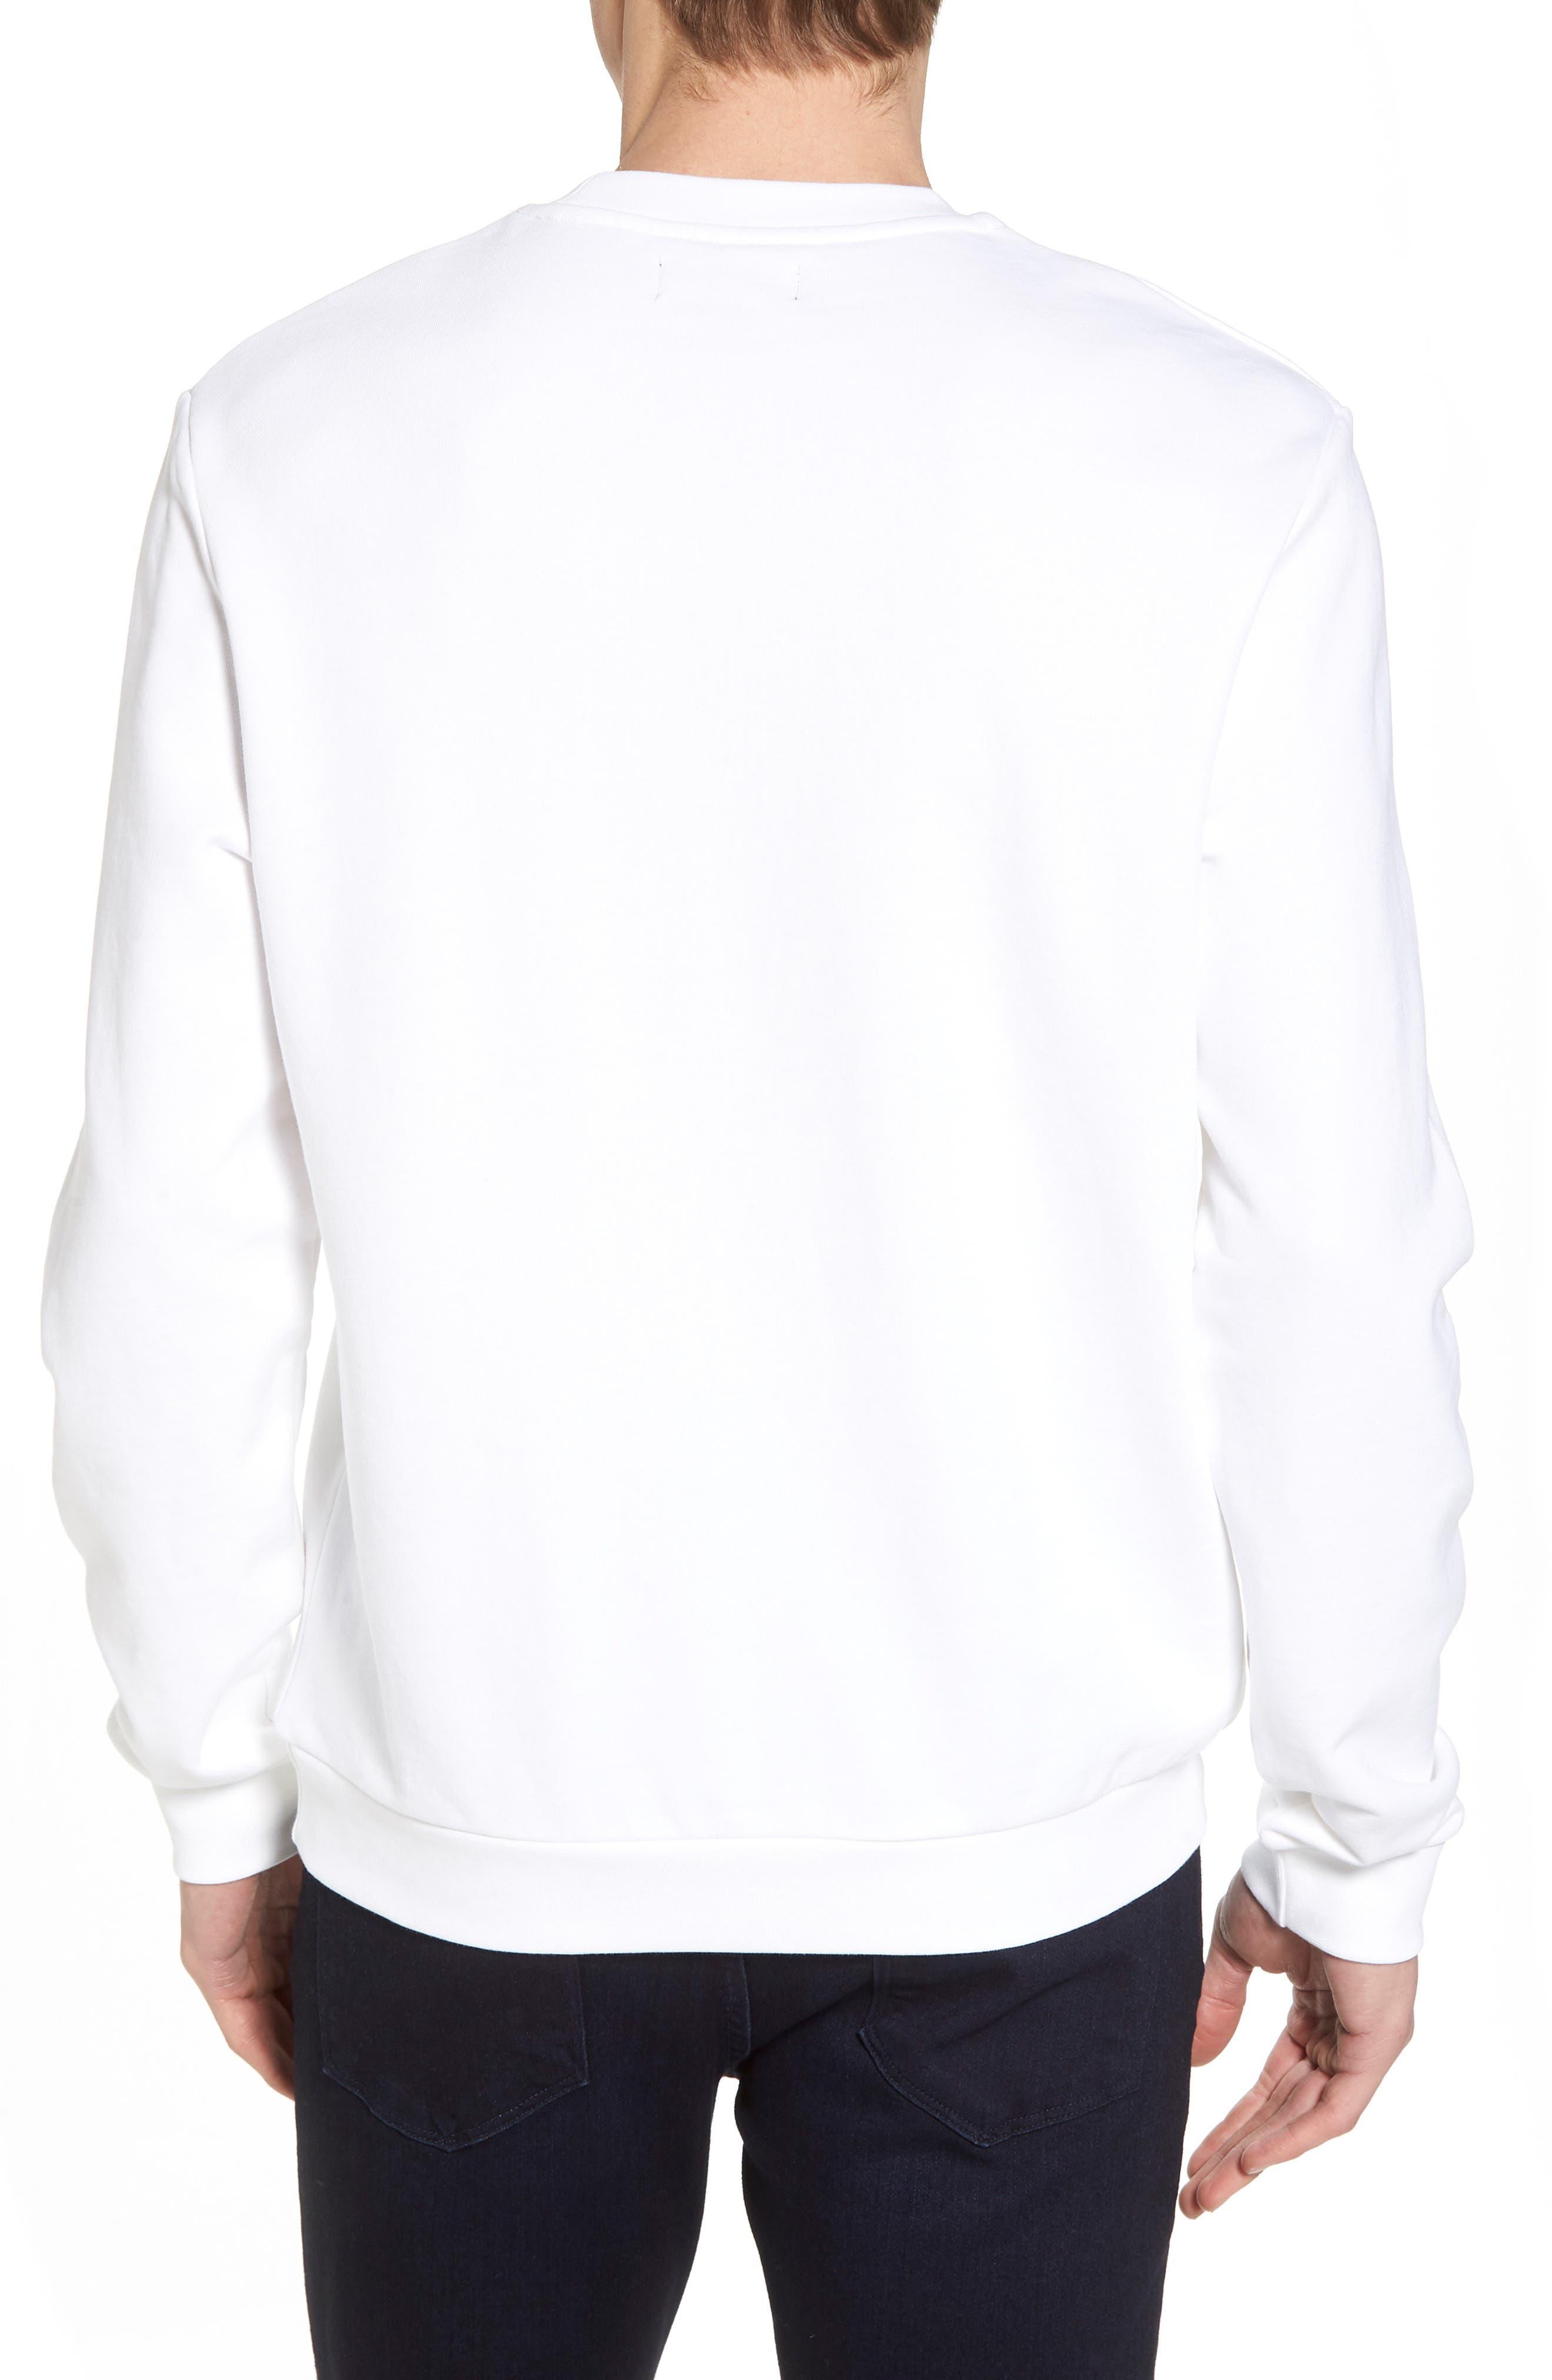 Tennis Sweatshirt,                             Alternate thumbnail 2, color,                             100